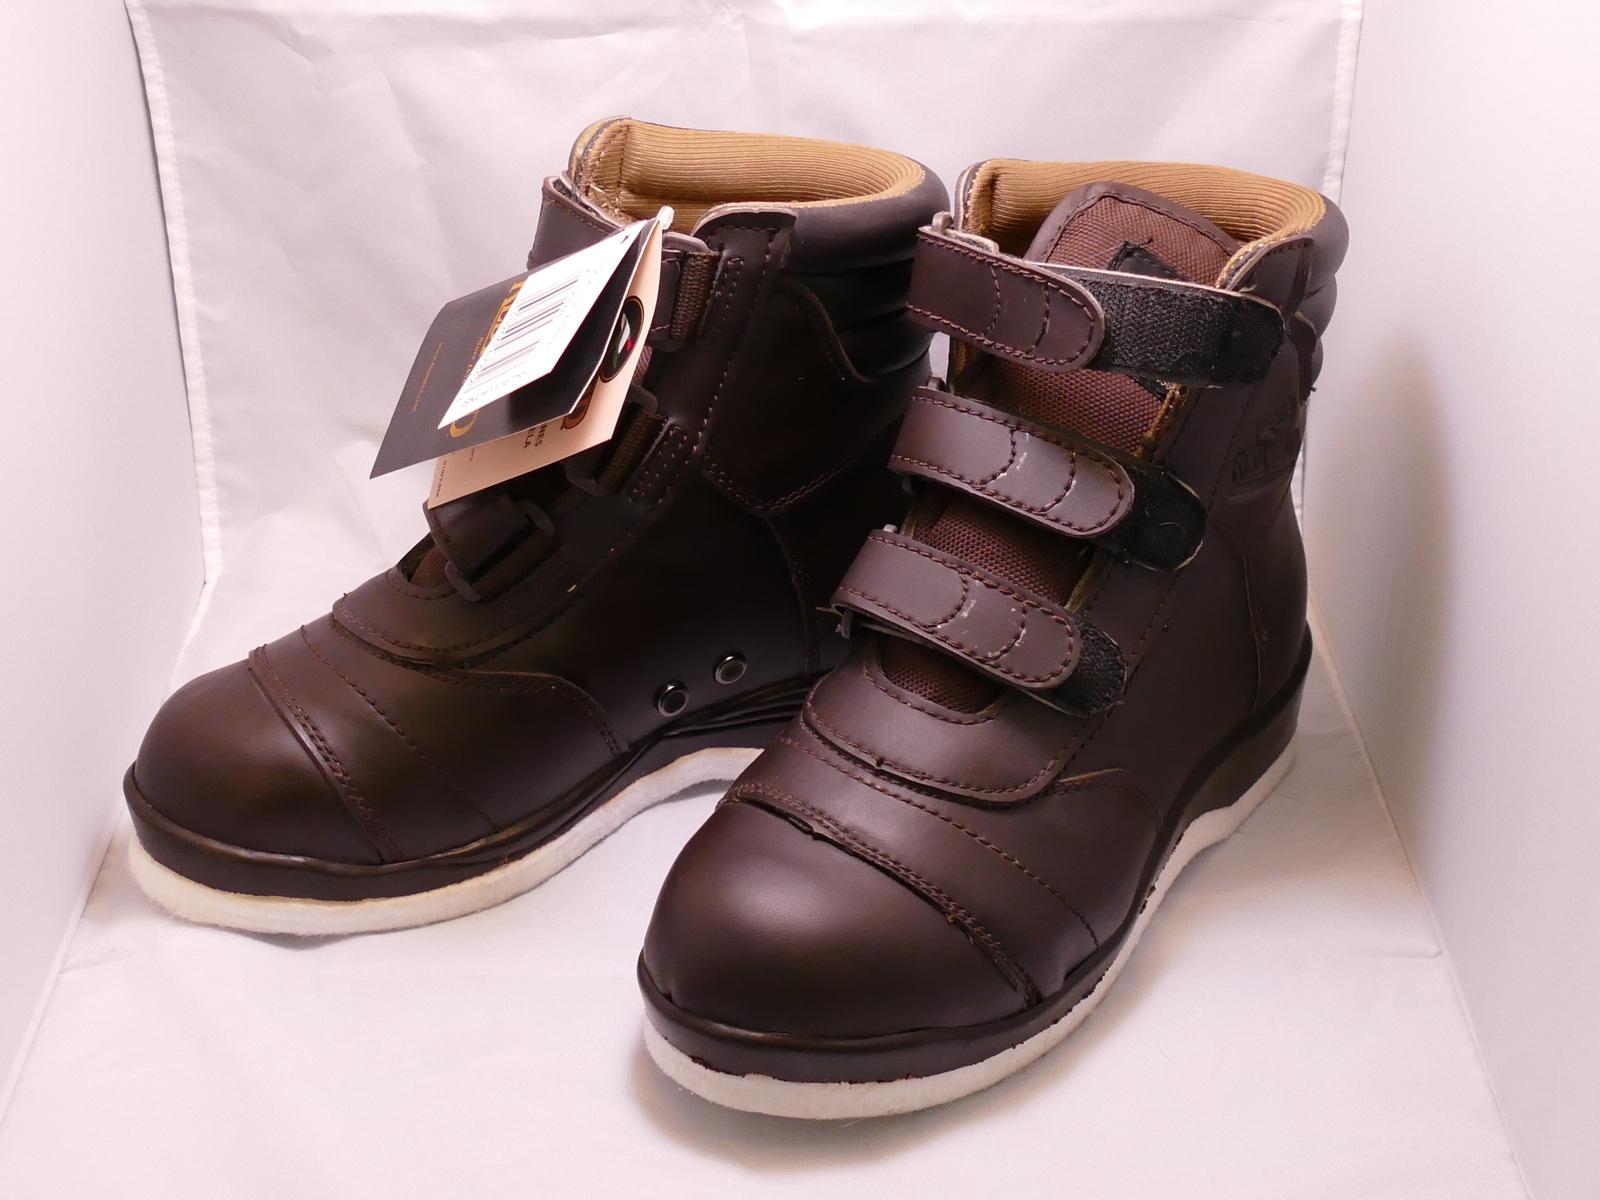 Felt boot 1